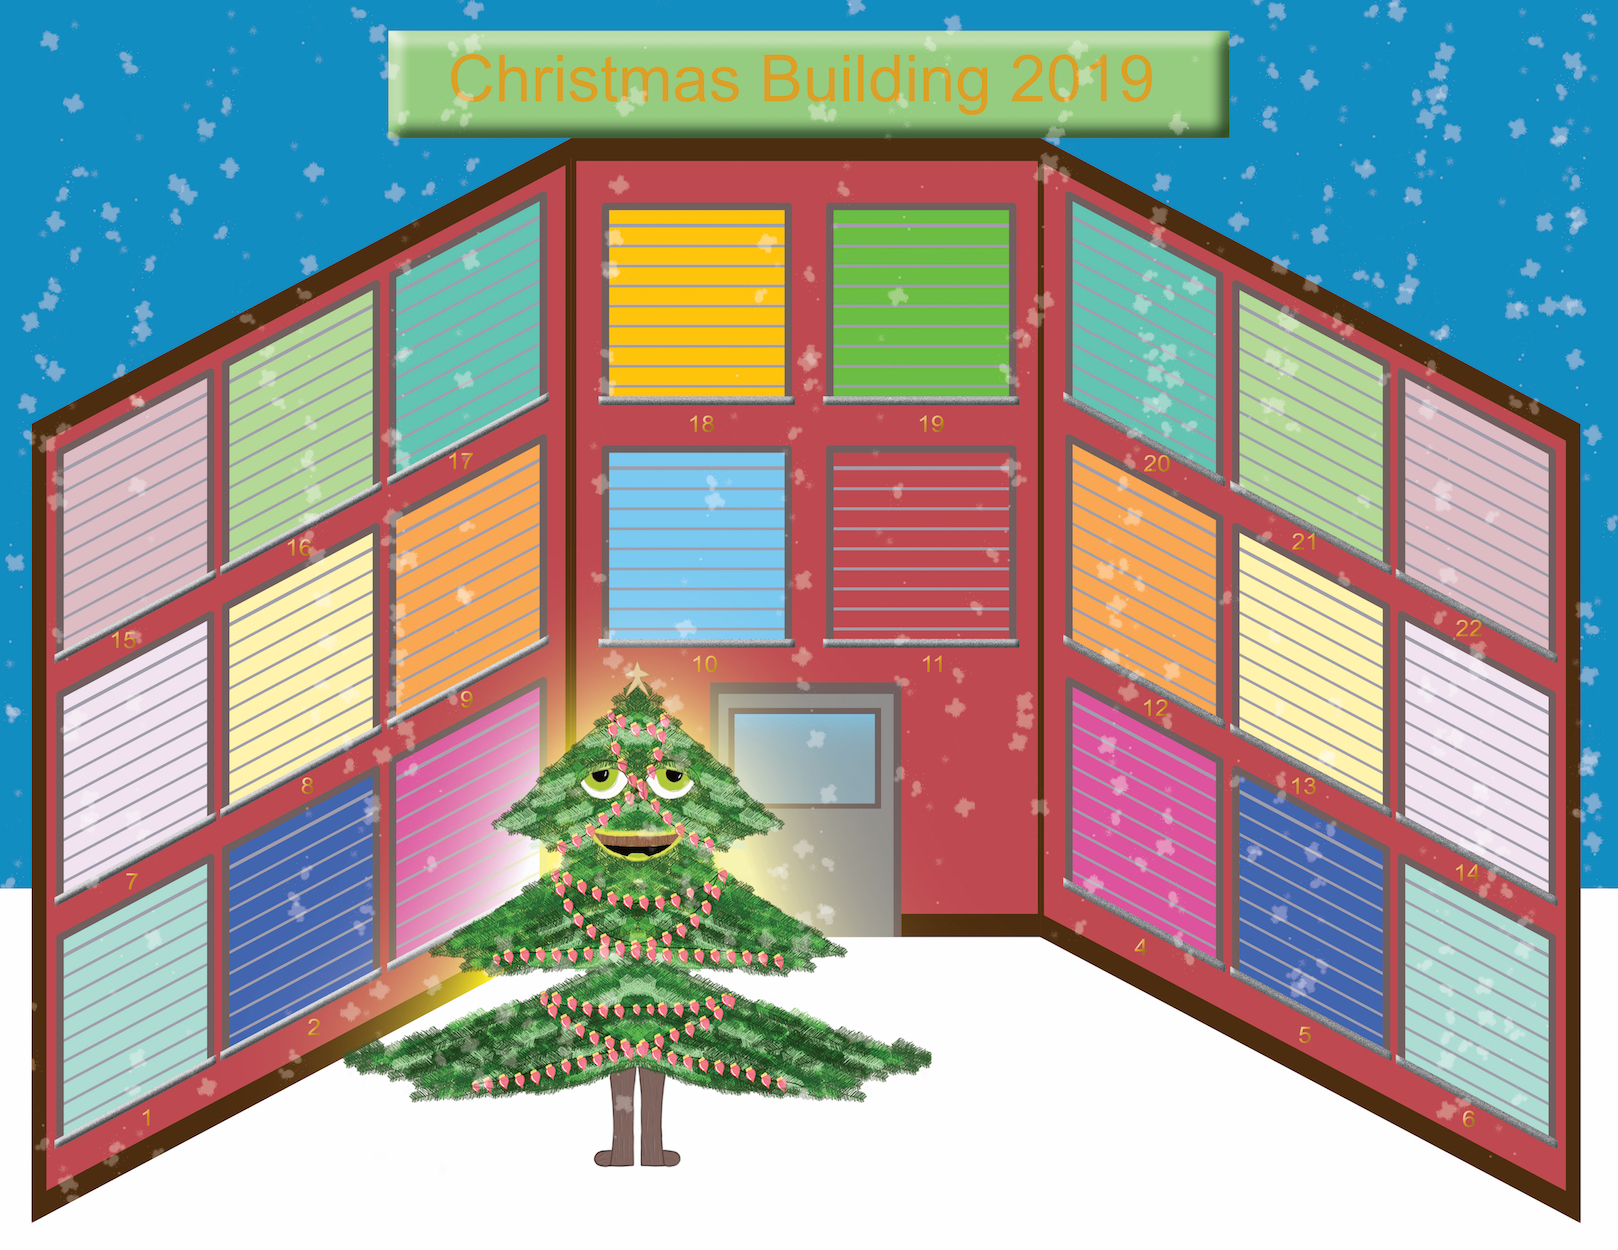 Christmas Building 2019